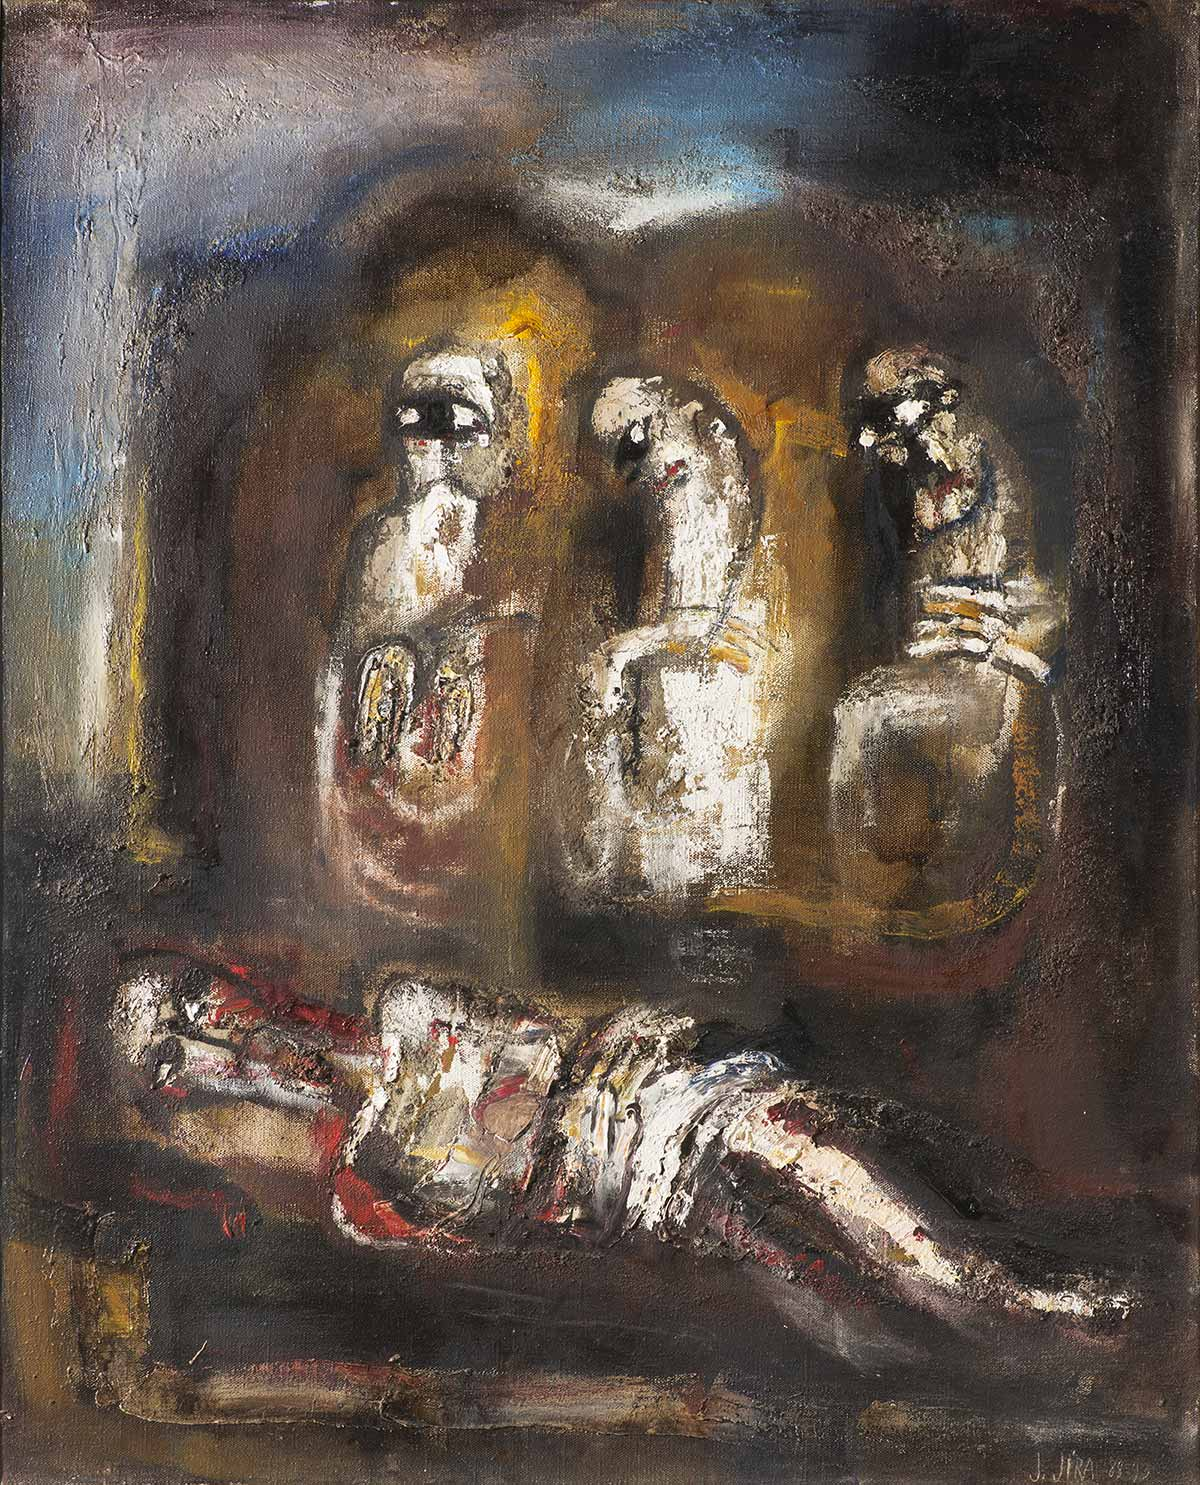 Arthouse-hejtmanek-Jira-aukce